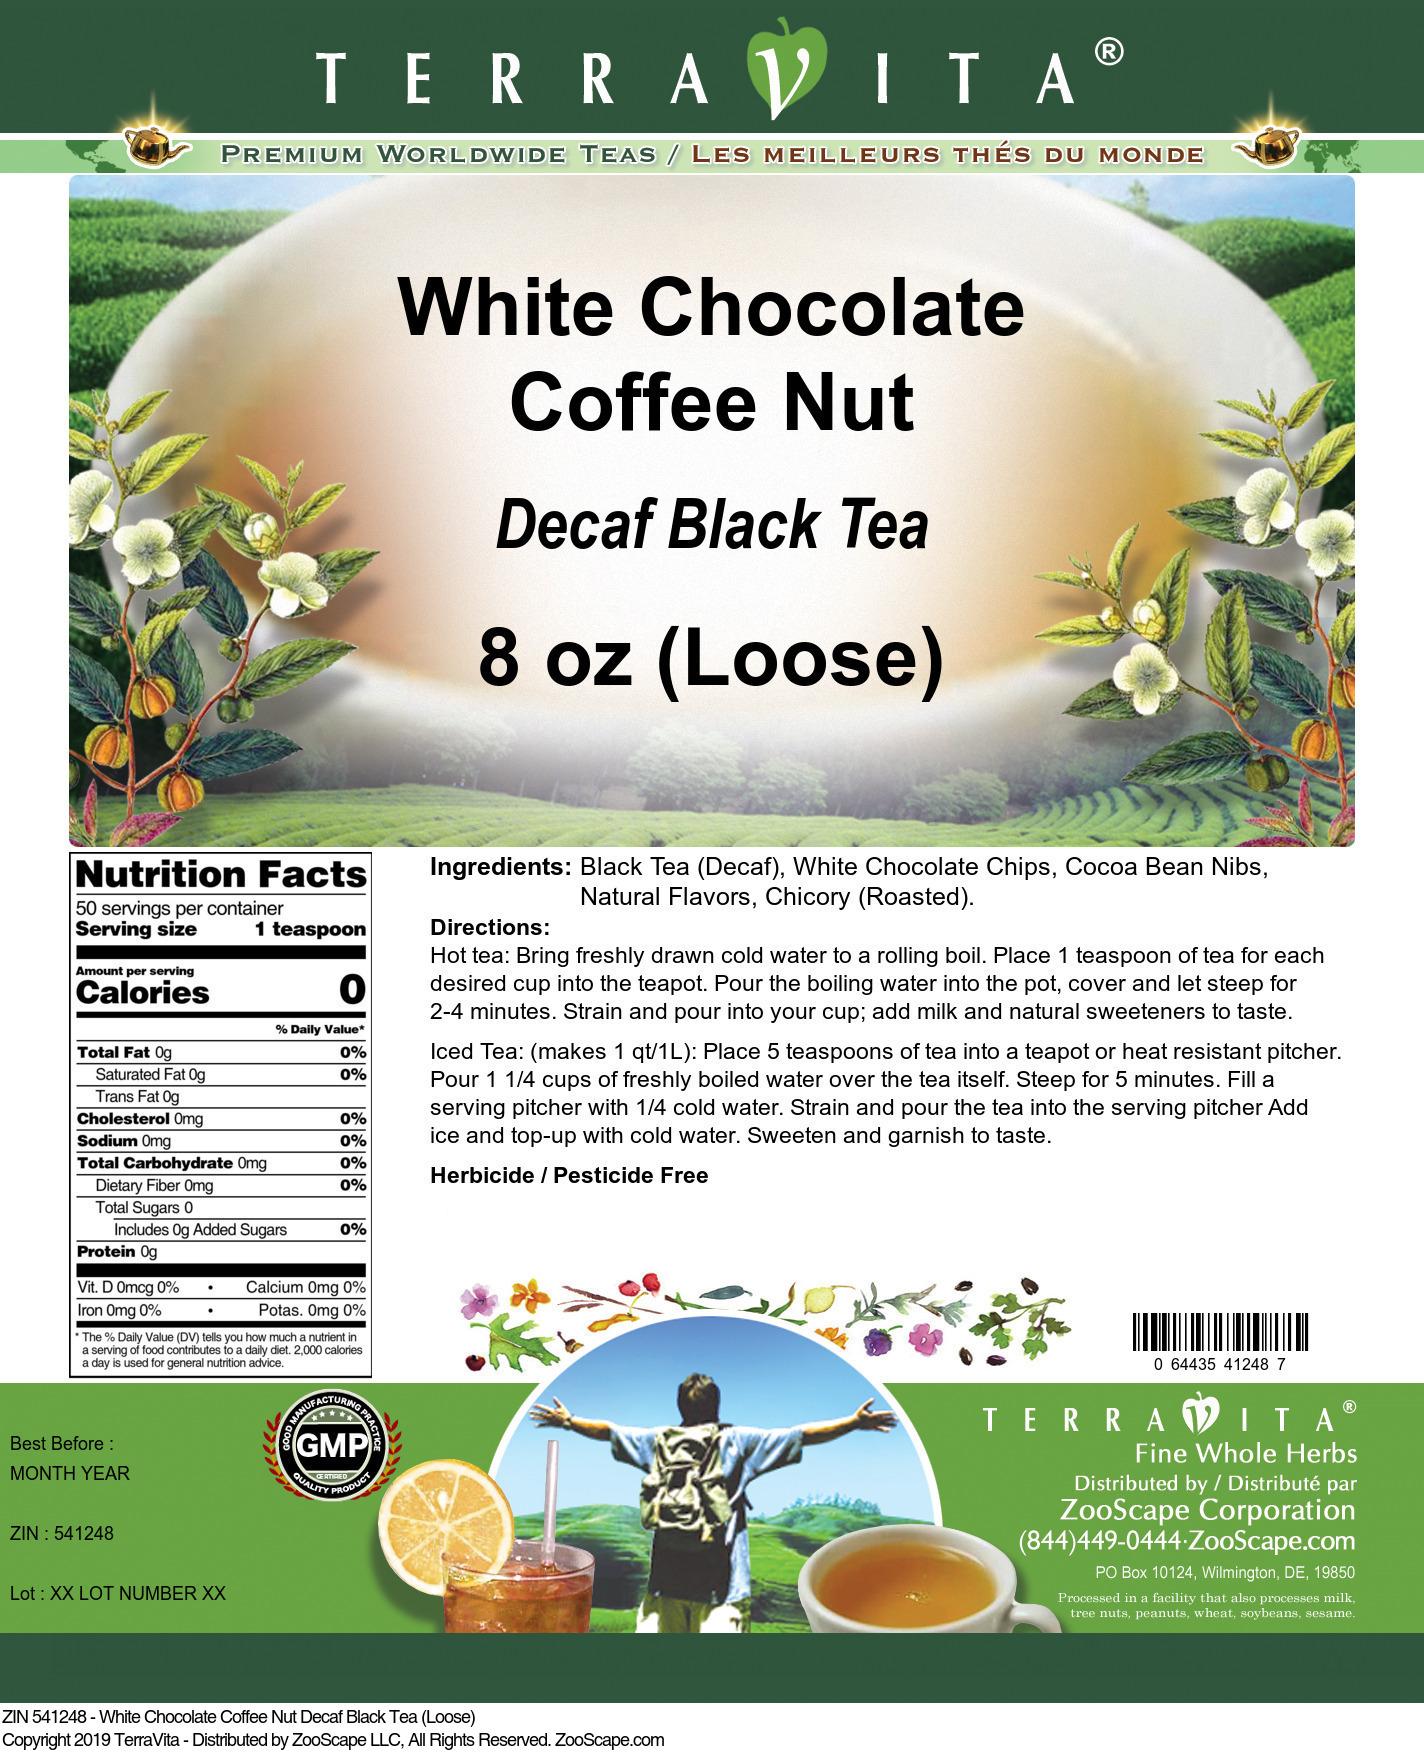 White Chocolate Coffee Nut Decaf Black Tea